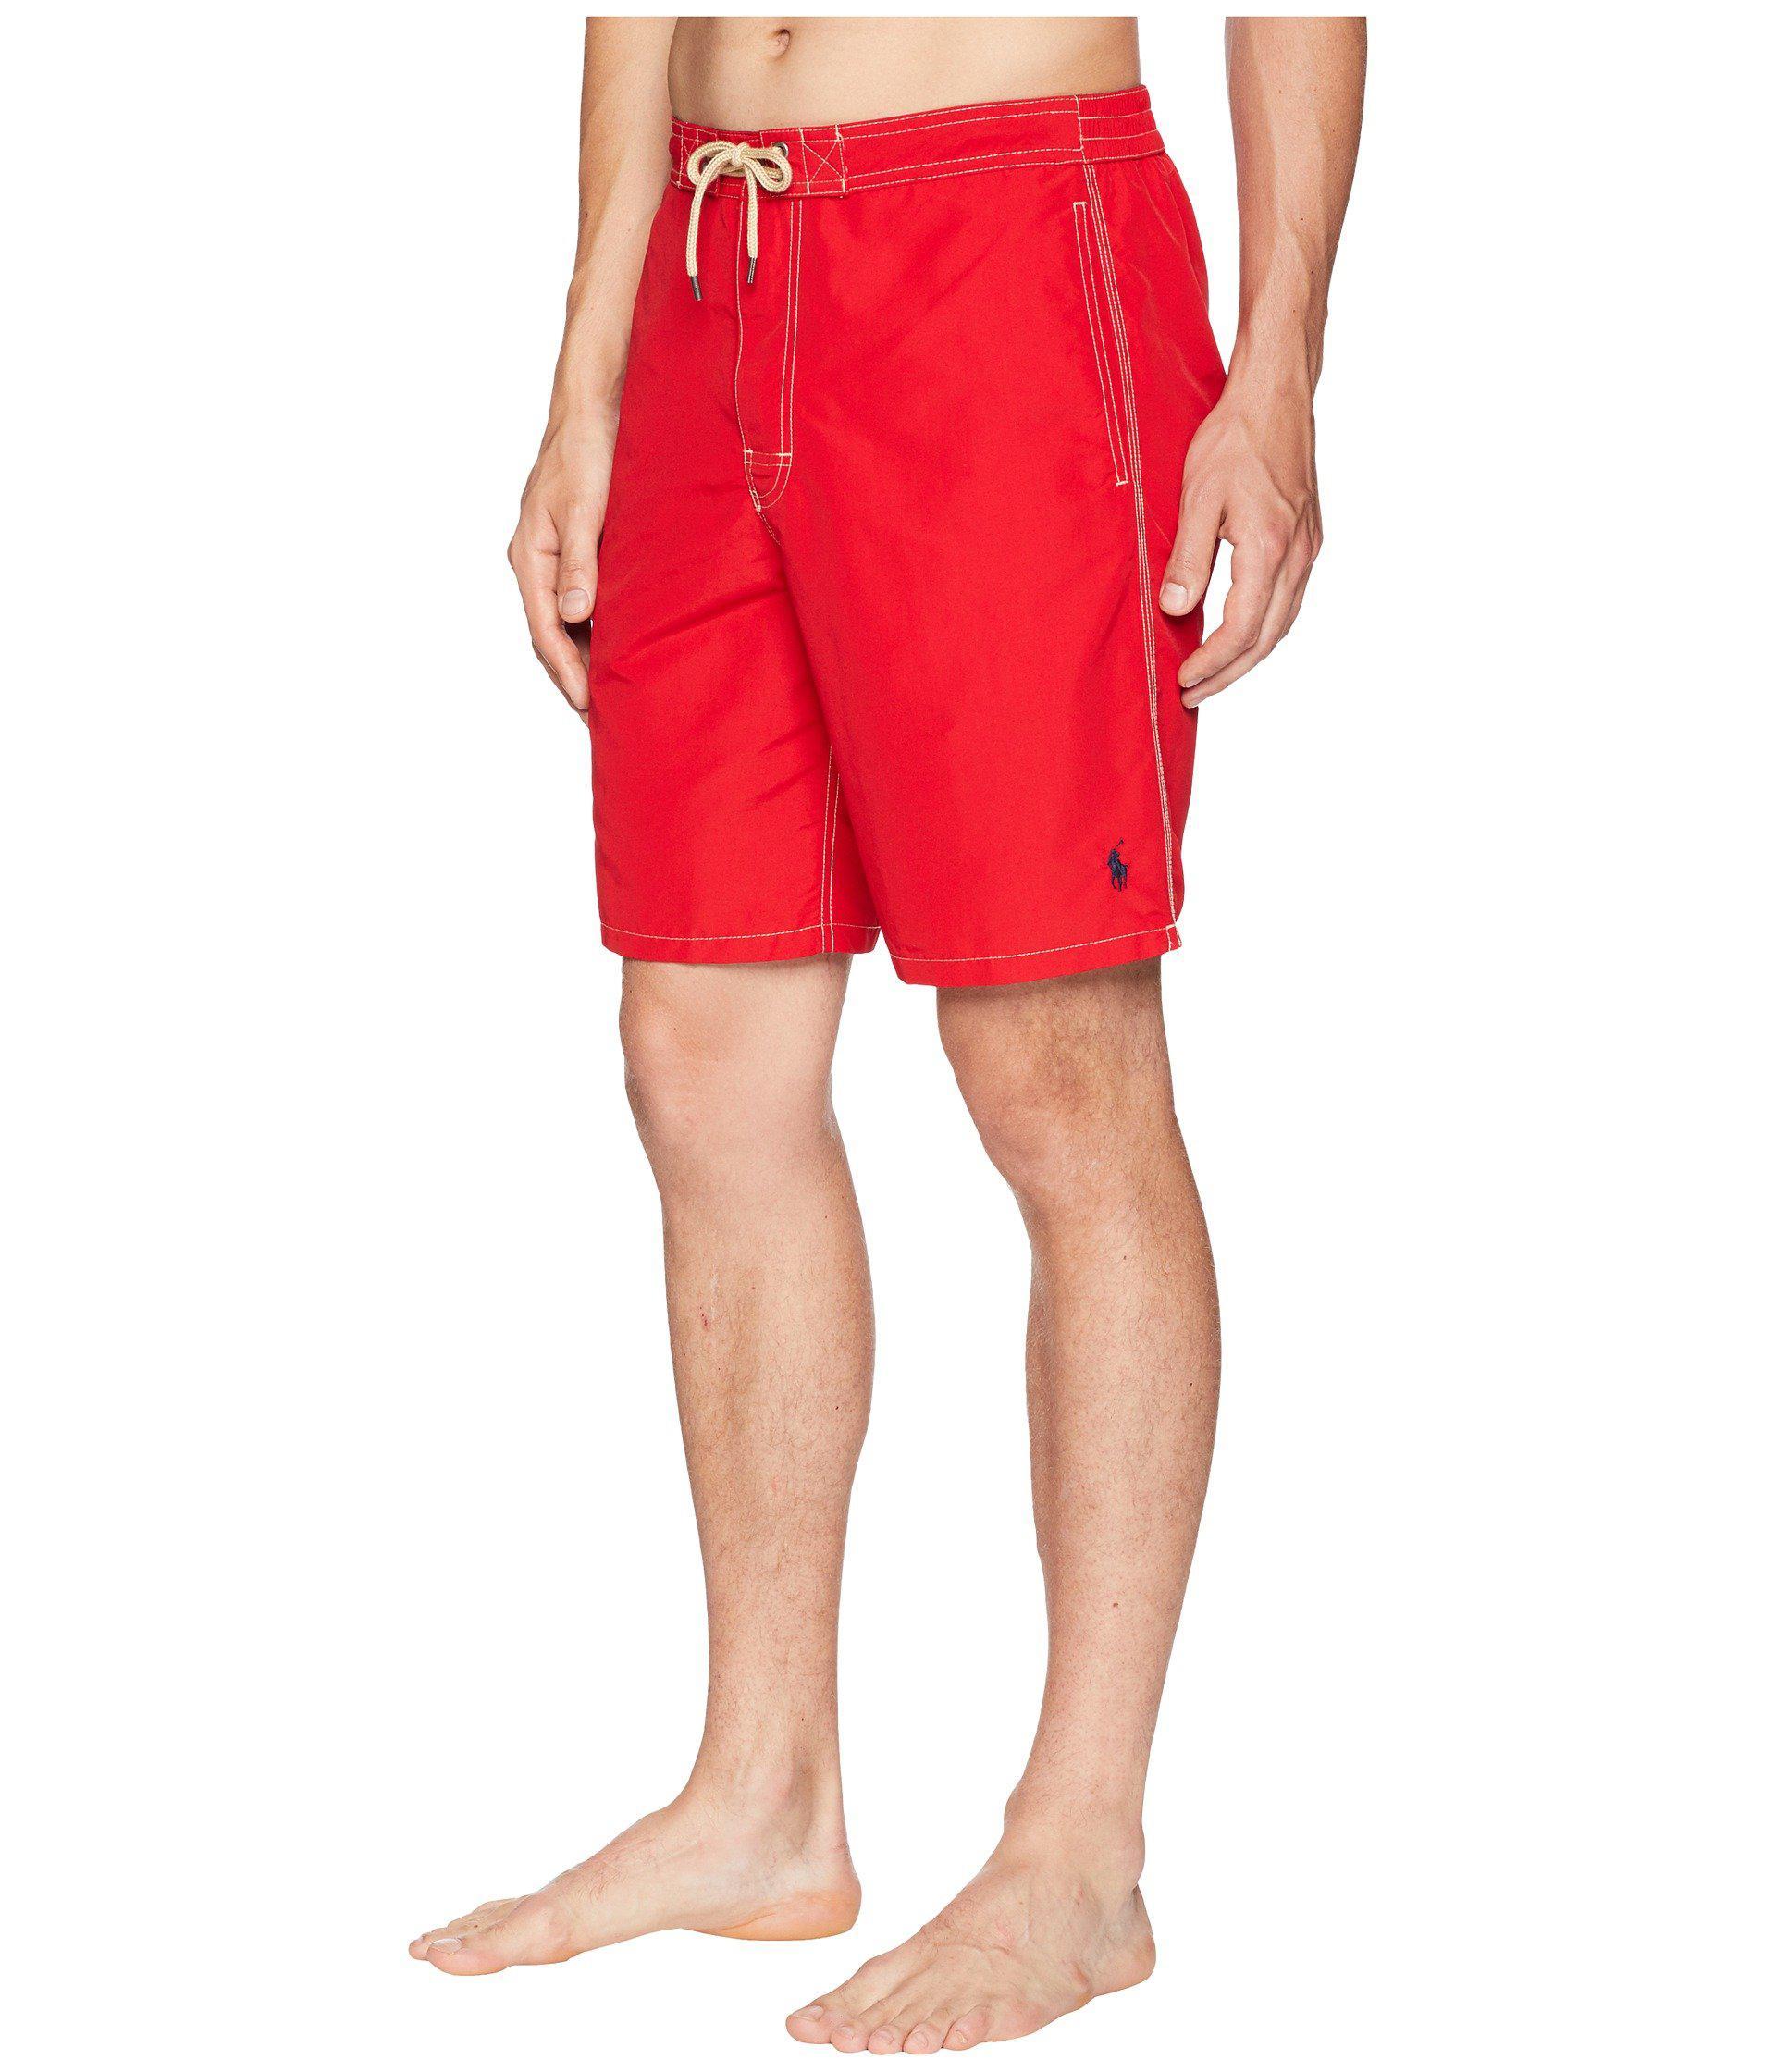 35f335074529f ... discount lyst polo ralph lauren kailua swim trunks hammond blue mens  swimwear in red for men